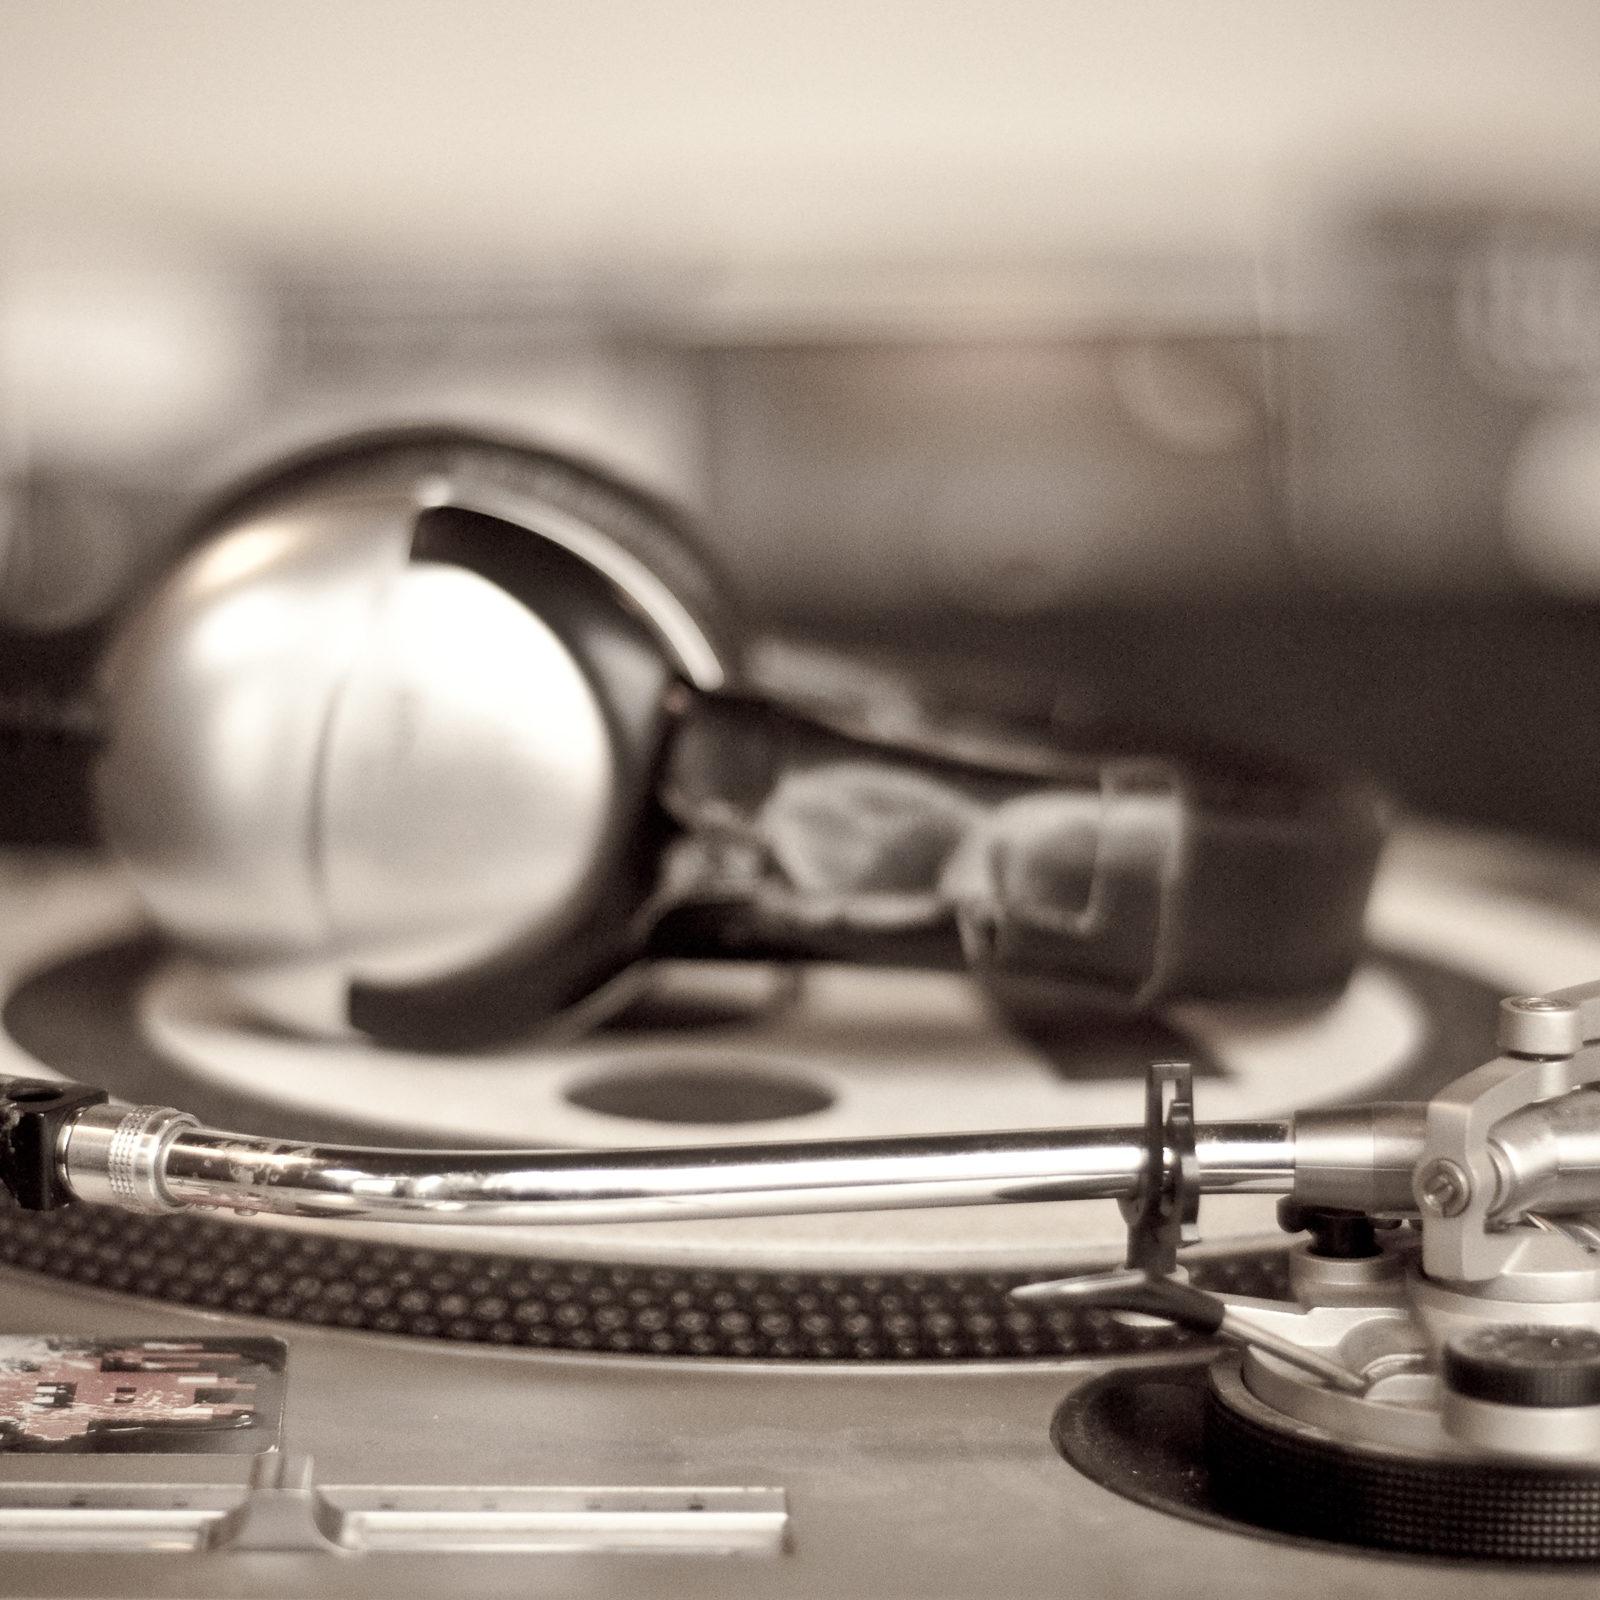 DJ-Mixer-Wallpaper-for-Desktop